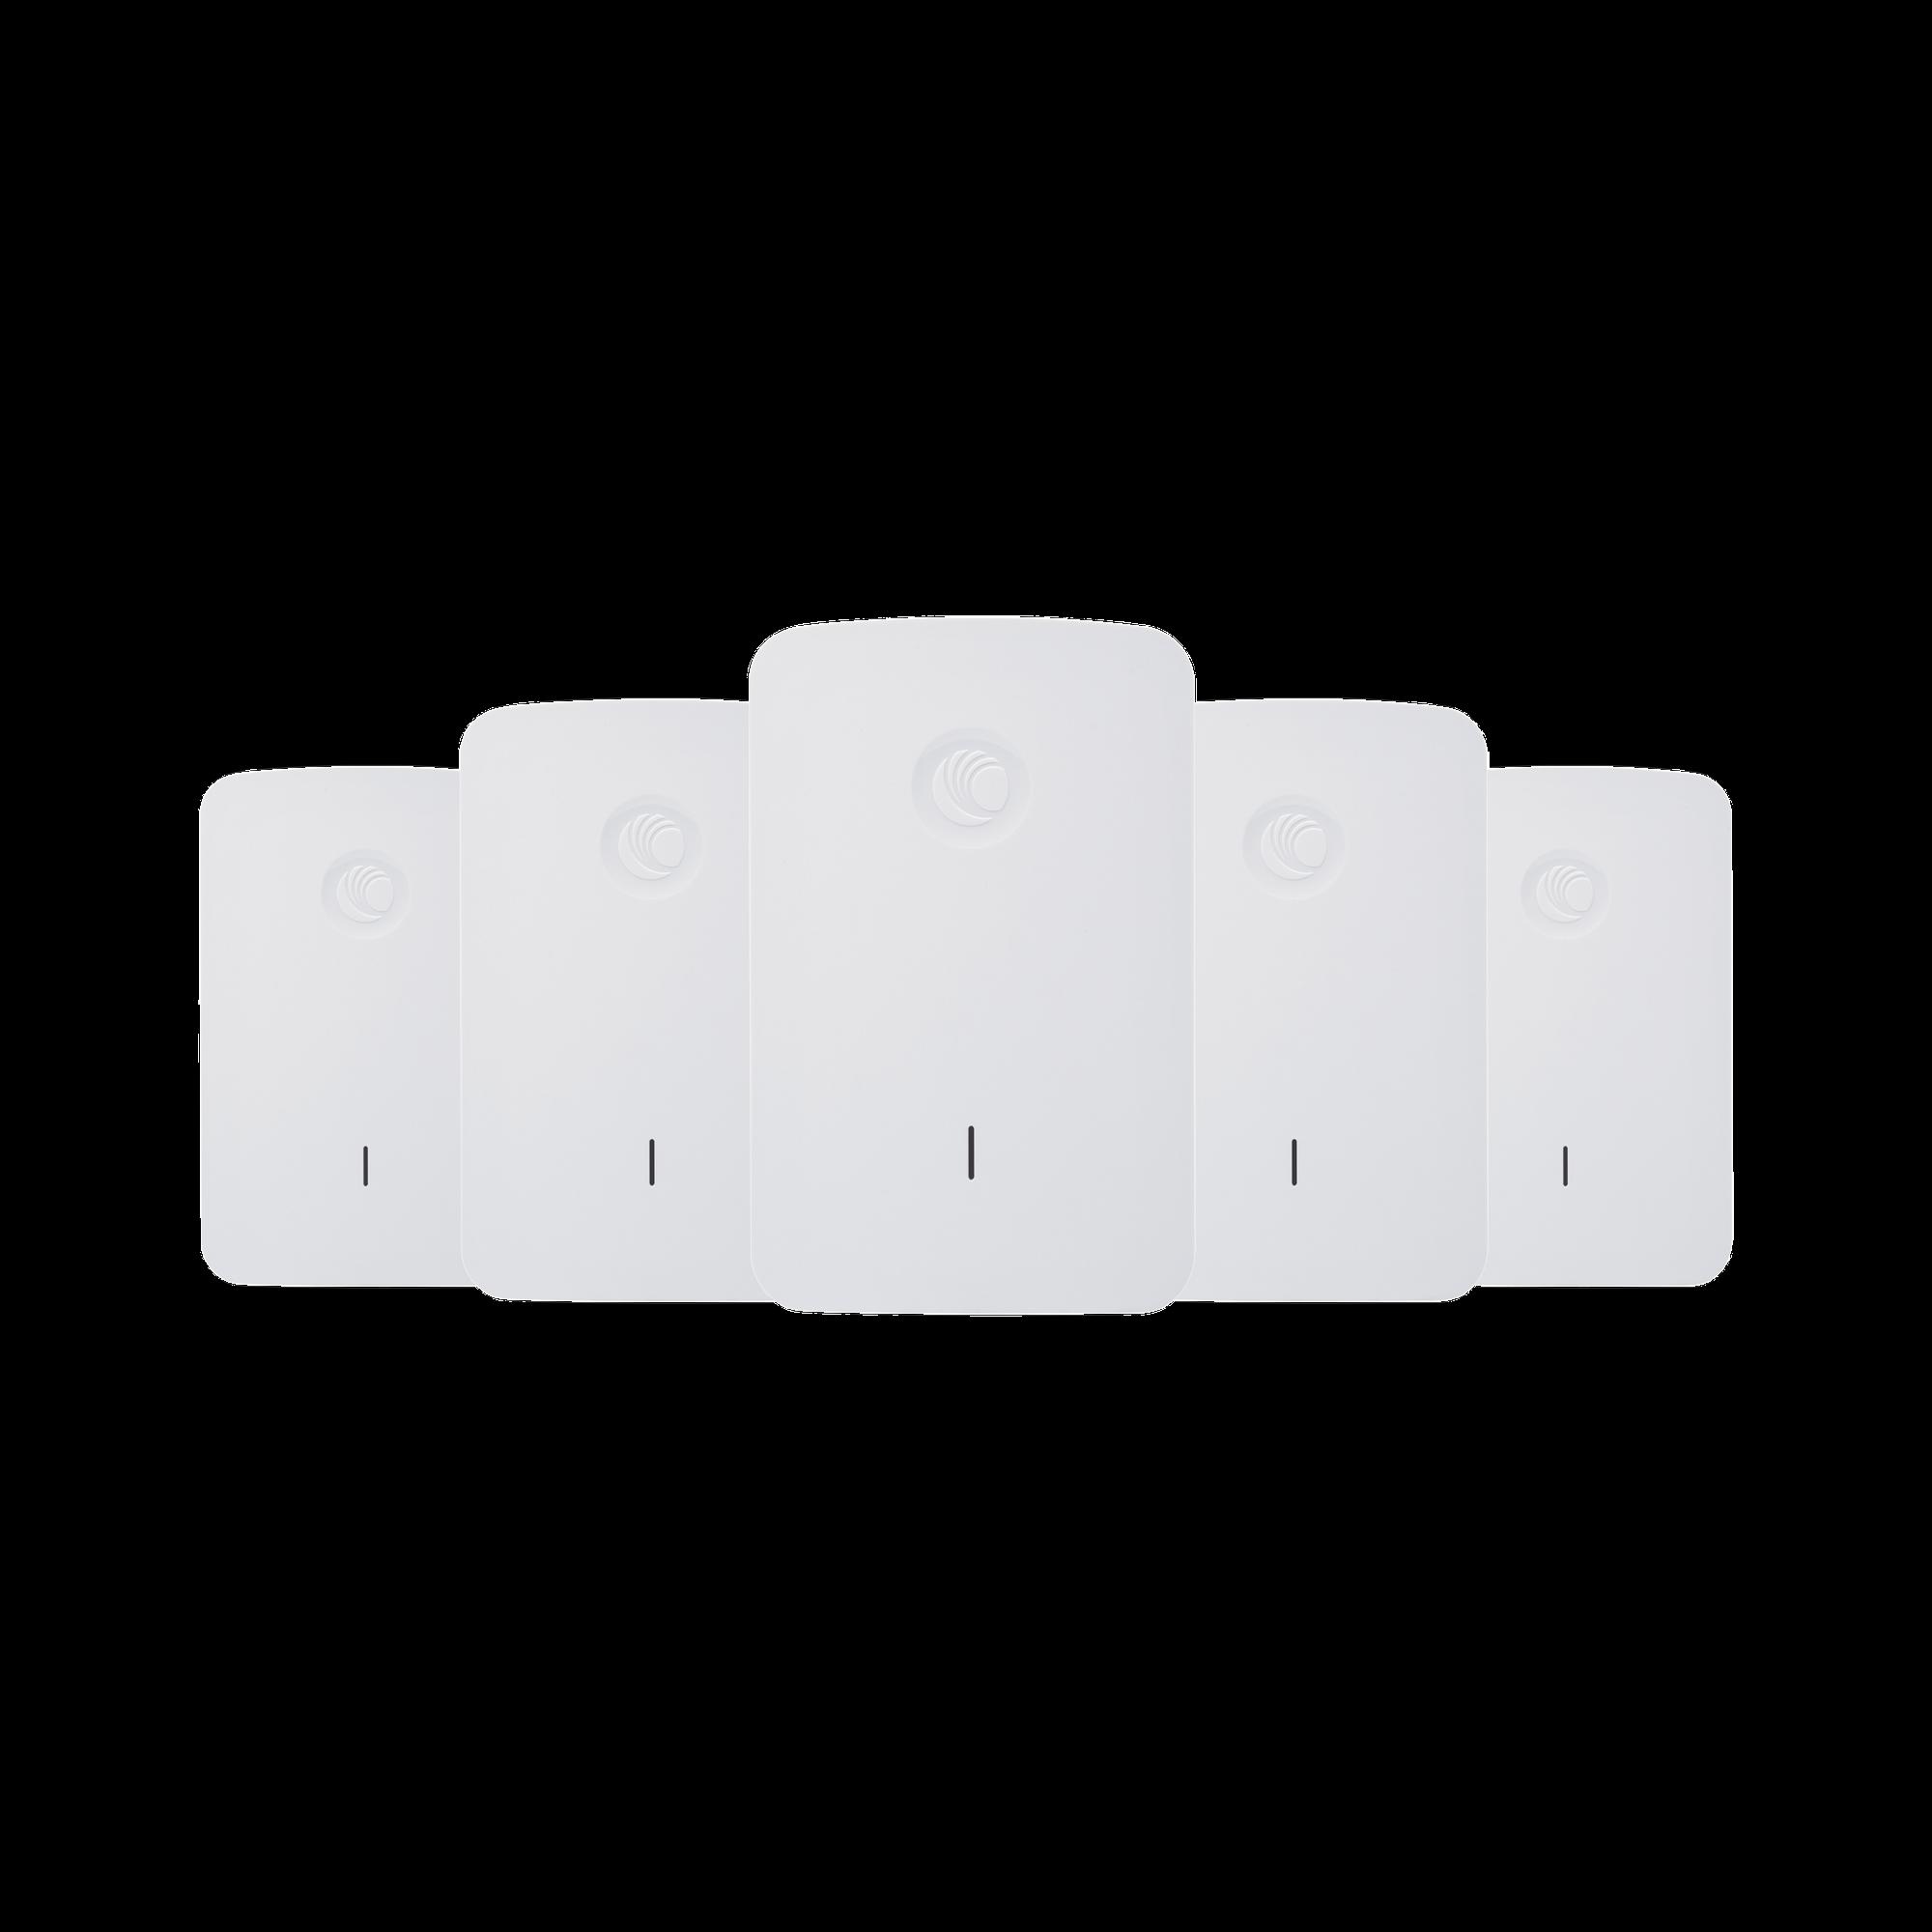 Kit Wi-Fi Empresarial de 5 Access Point e425H